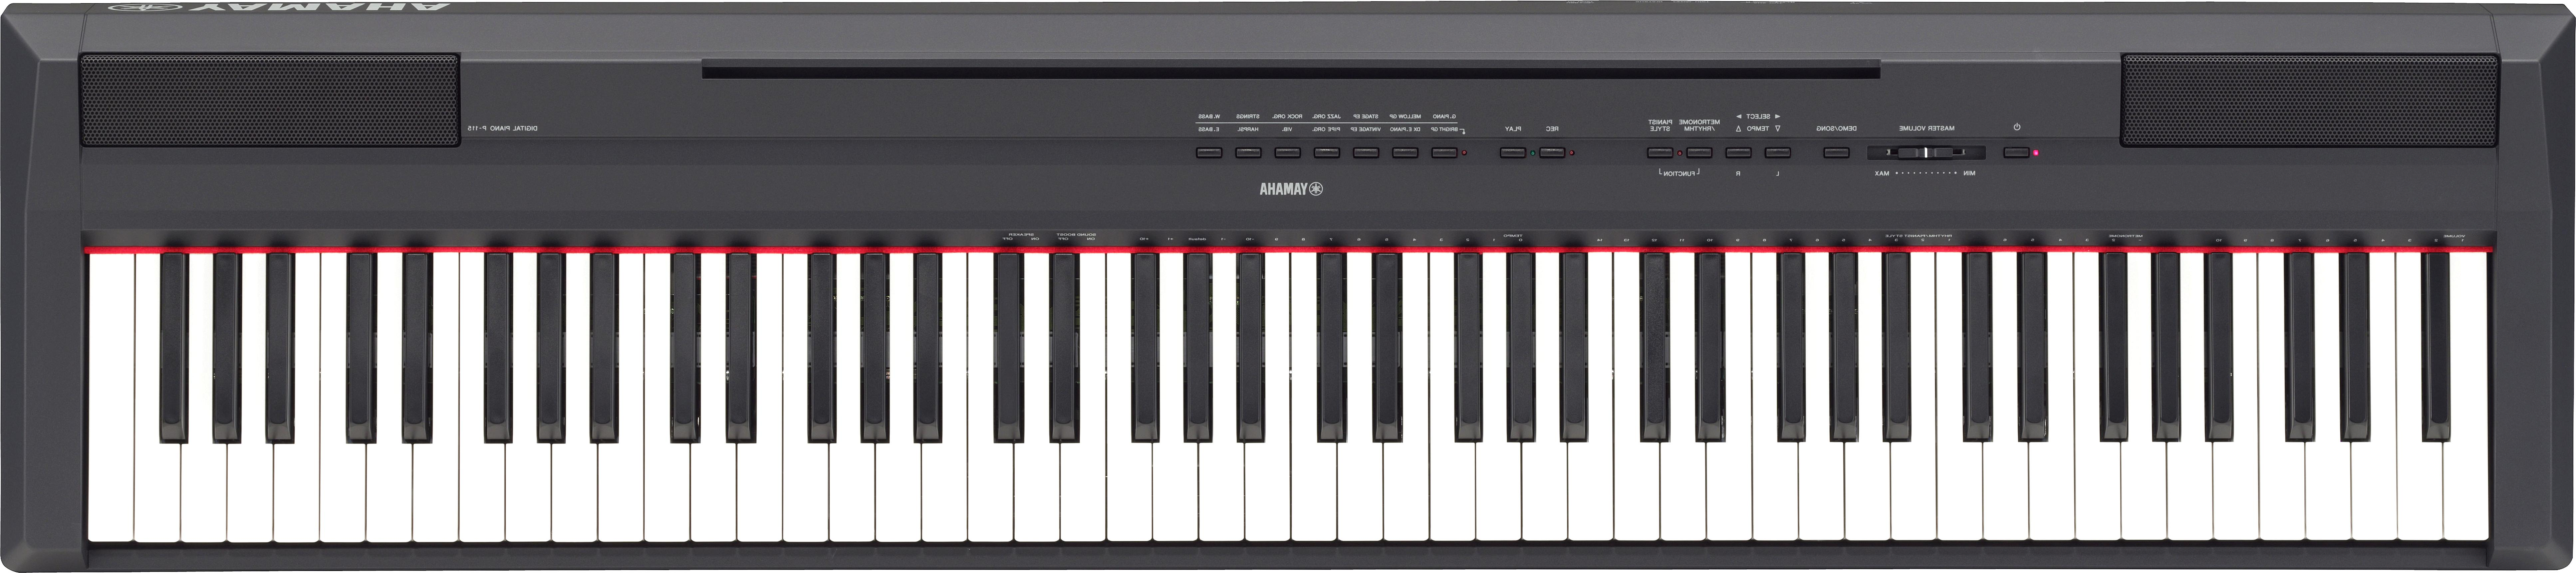 yamaha digital piano p 115 for sale